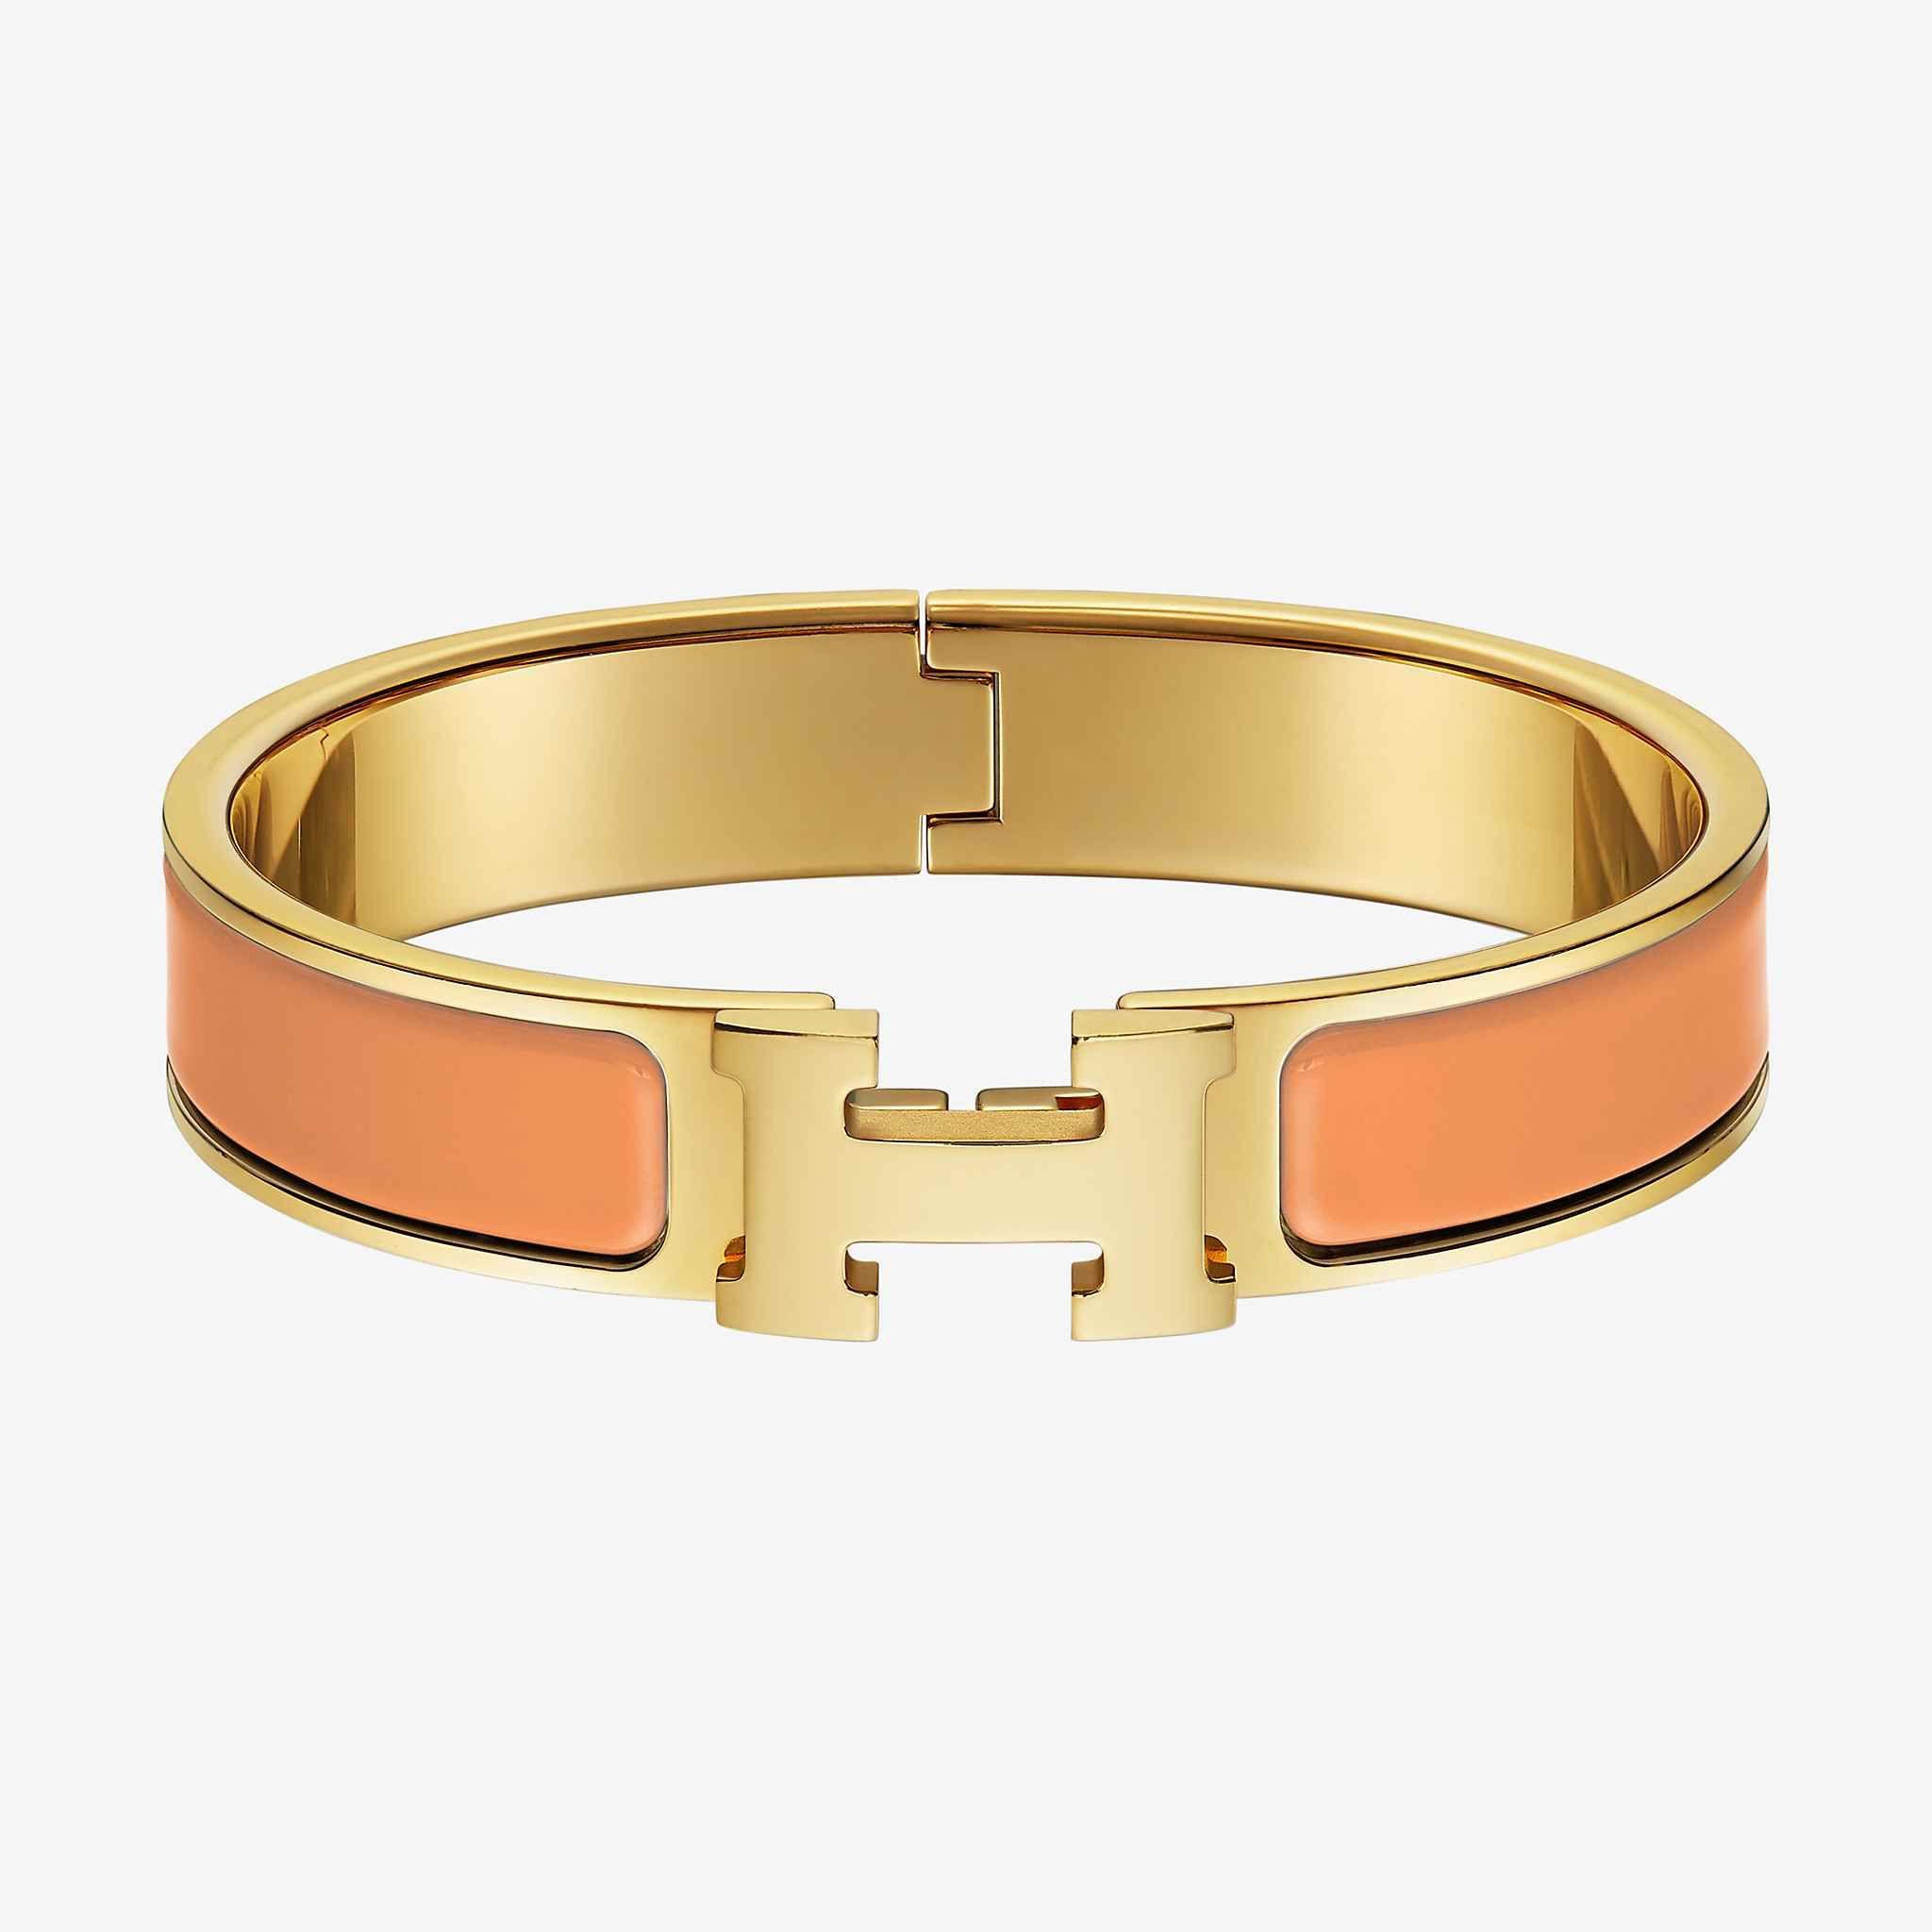 Clic h bracelet in spring pinterest bracelets jewelry